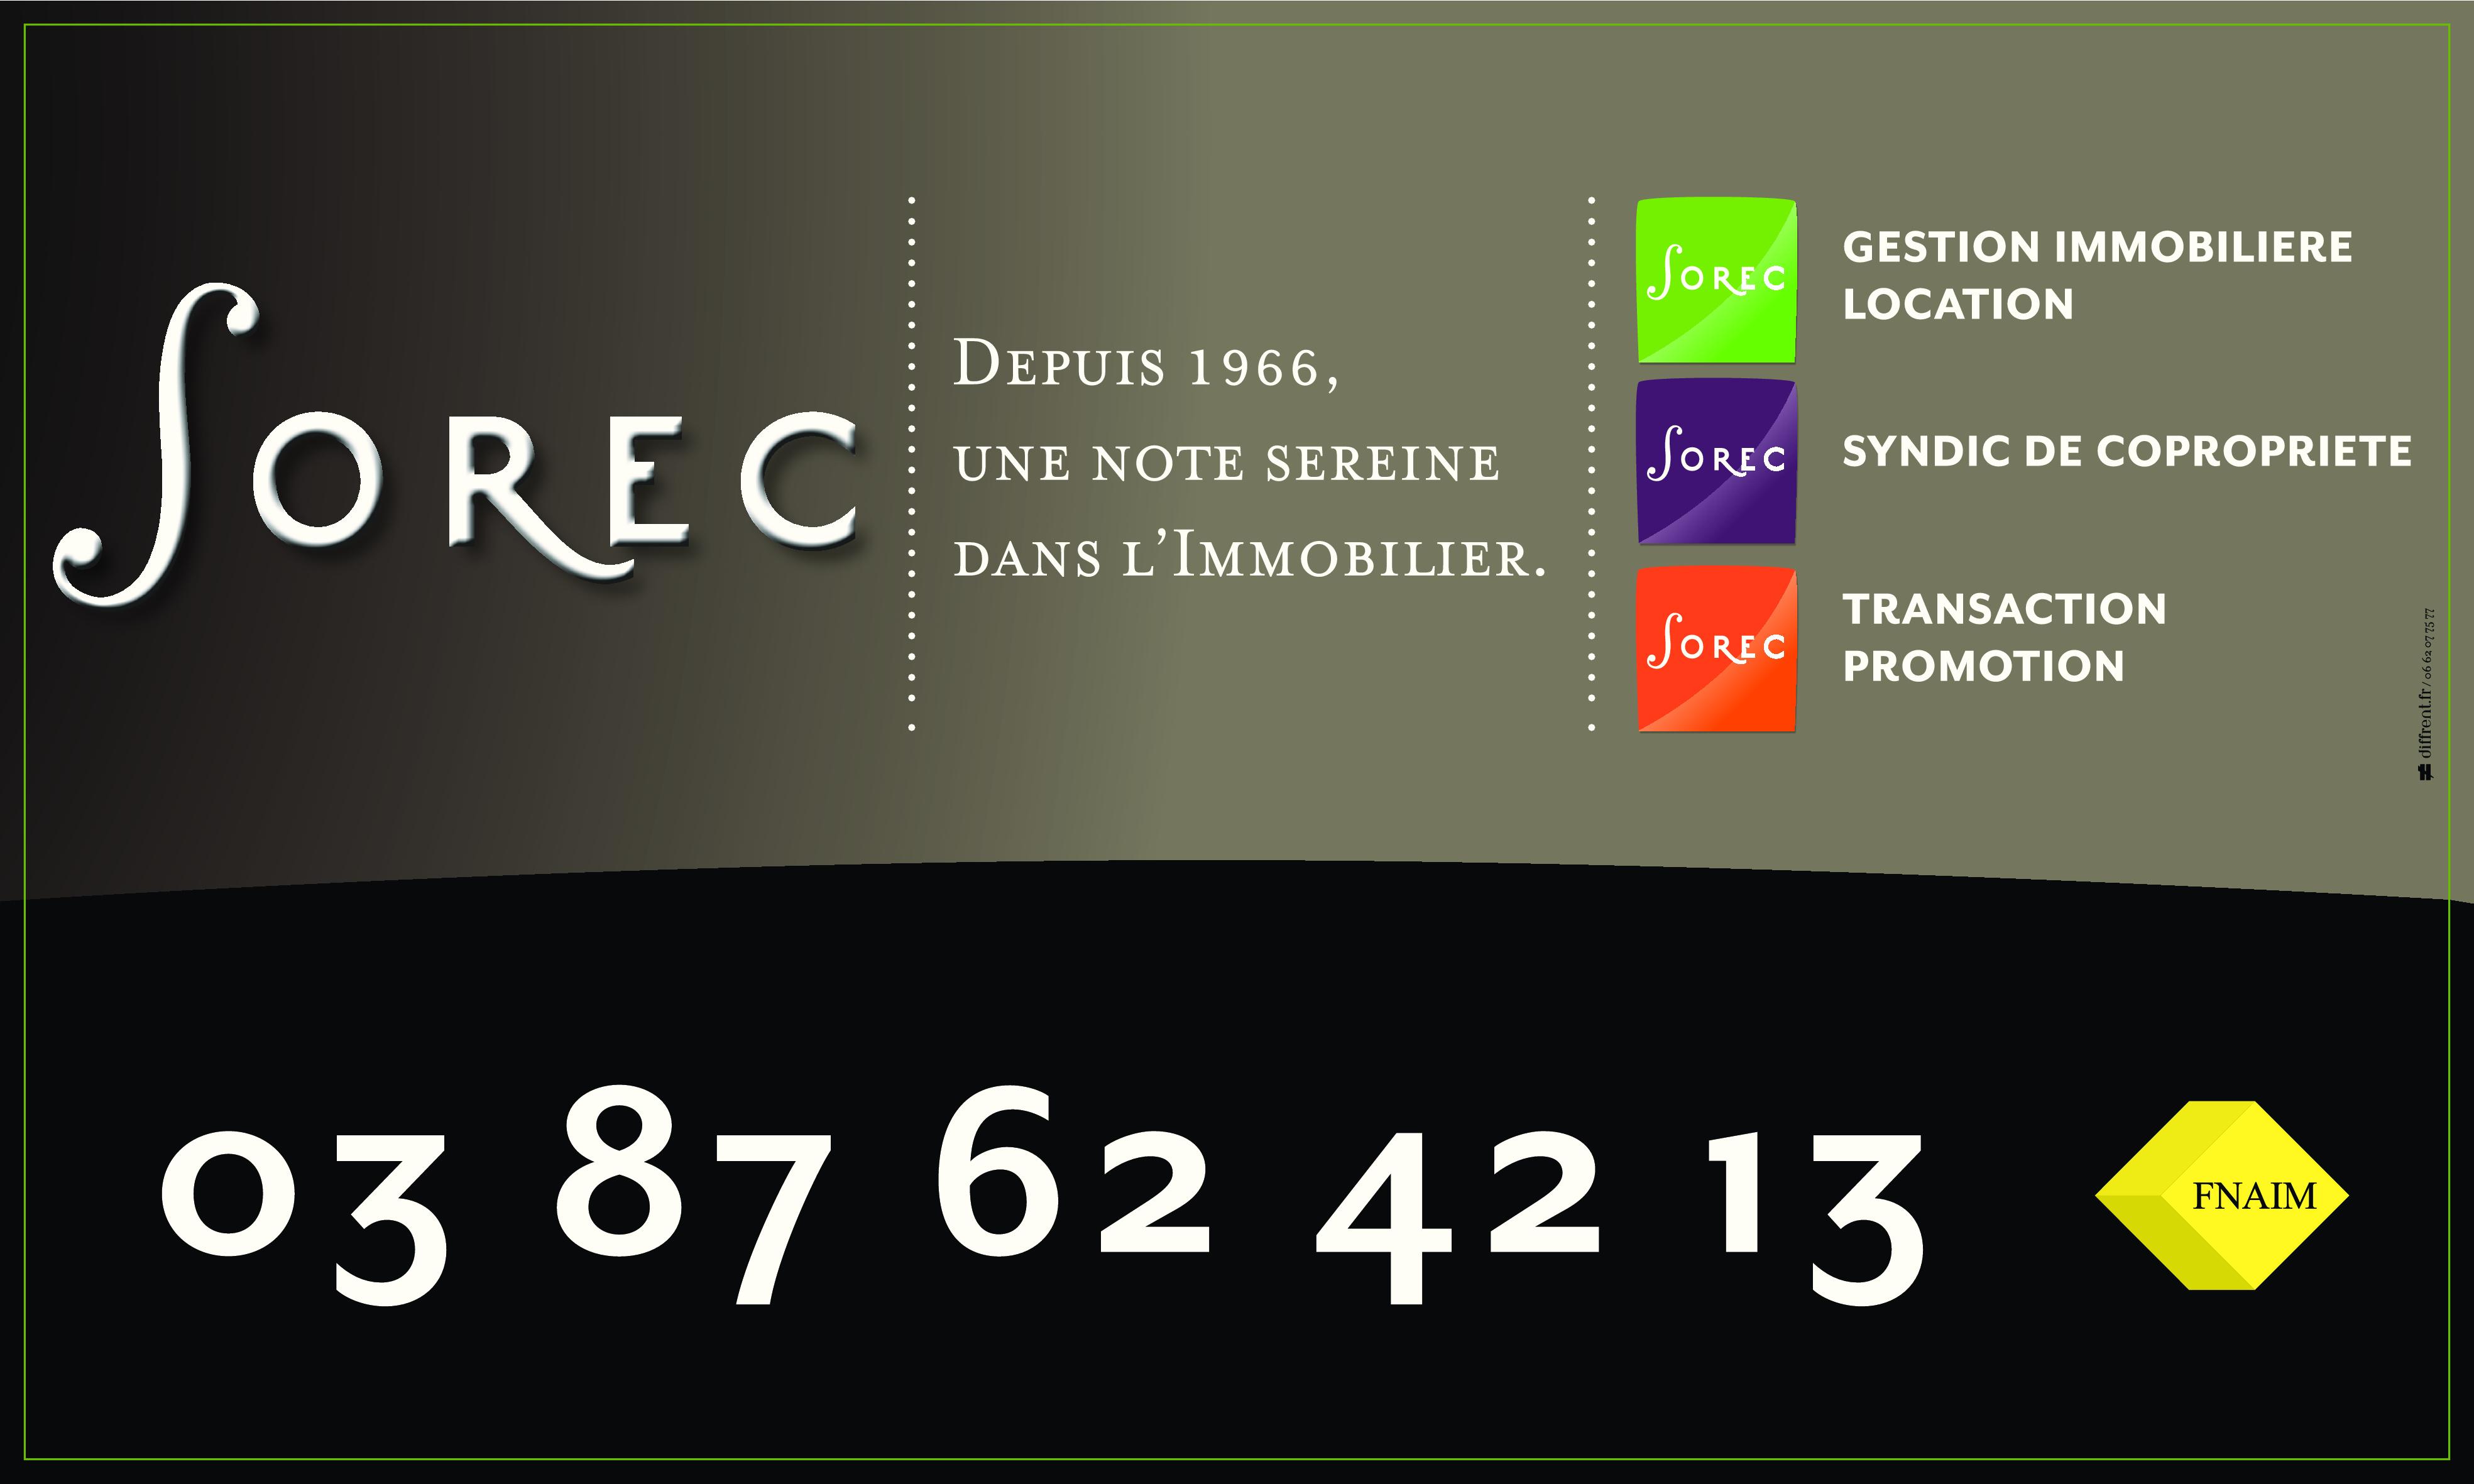 SOREC_GRANGE-ORMES_490X290_1EX-8